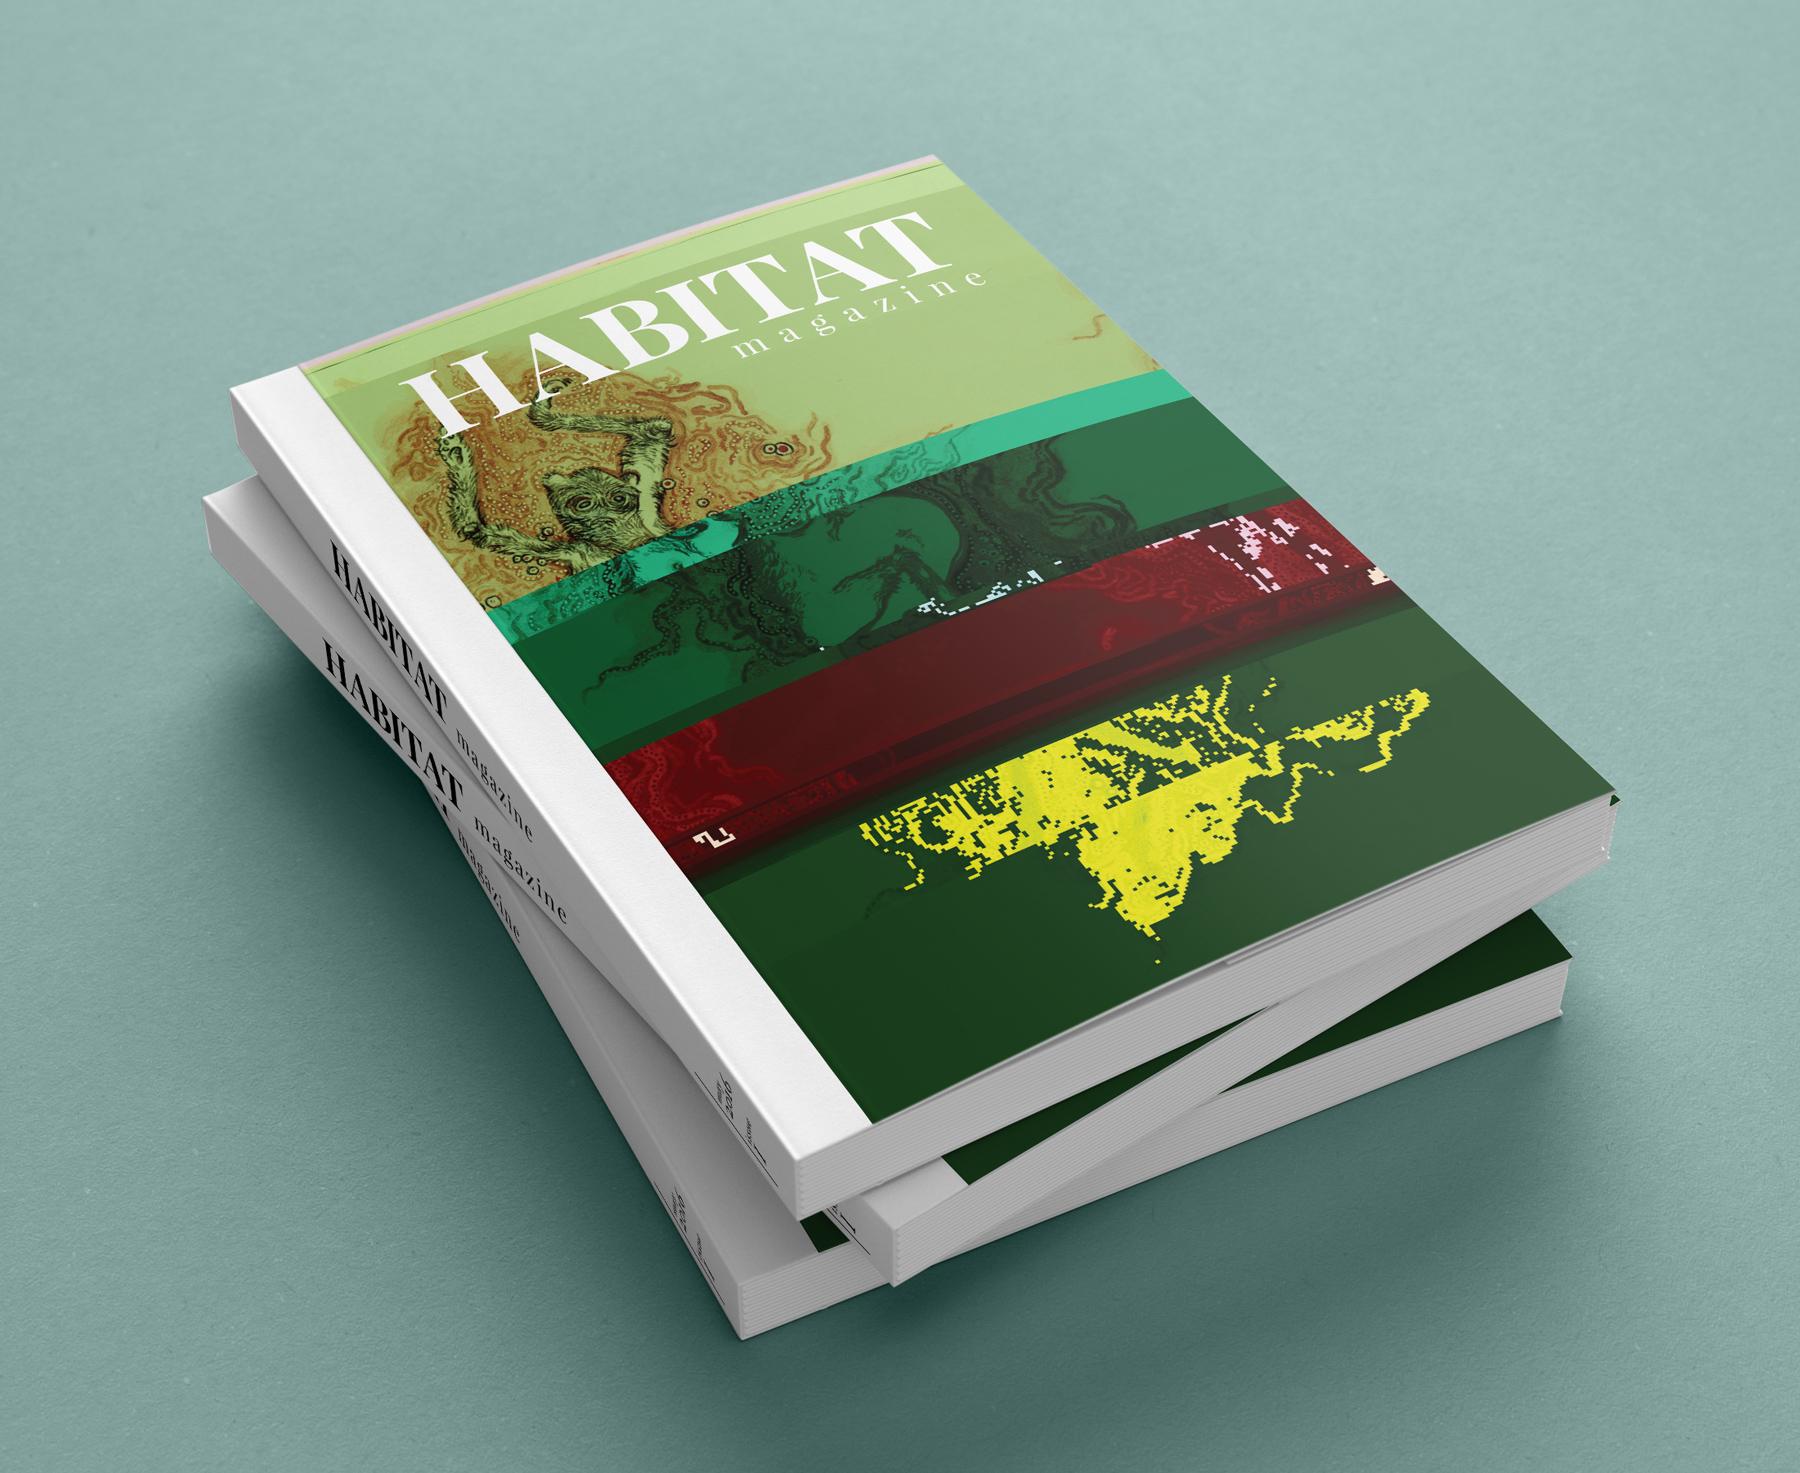 HABITAT-MAG_Book_Mockup_1.jpg